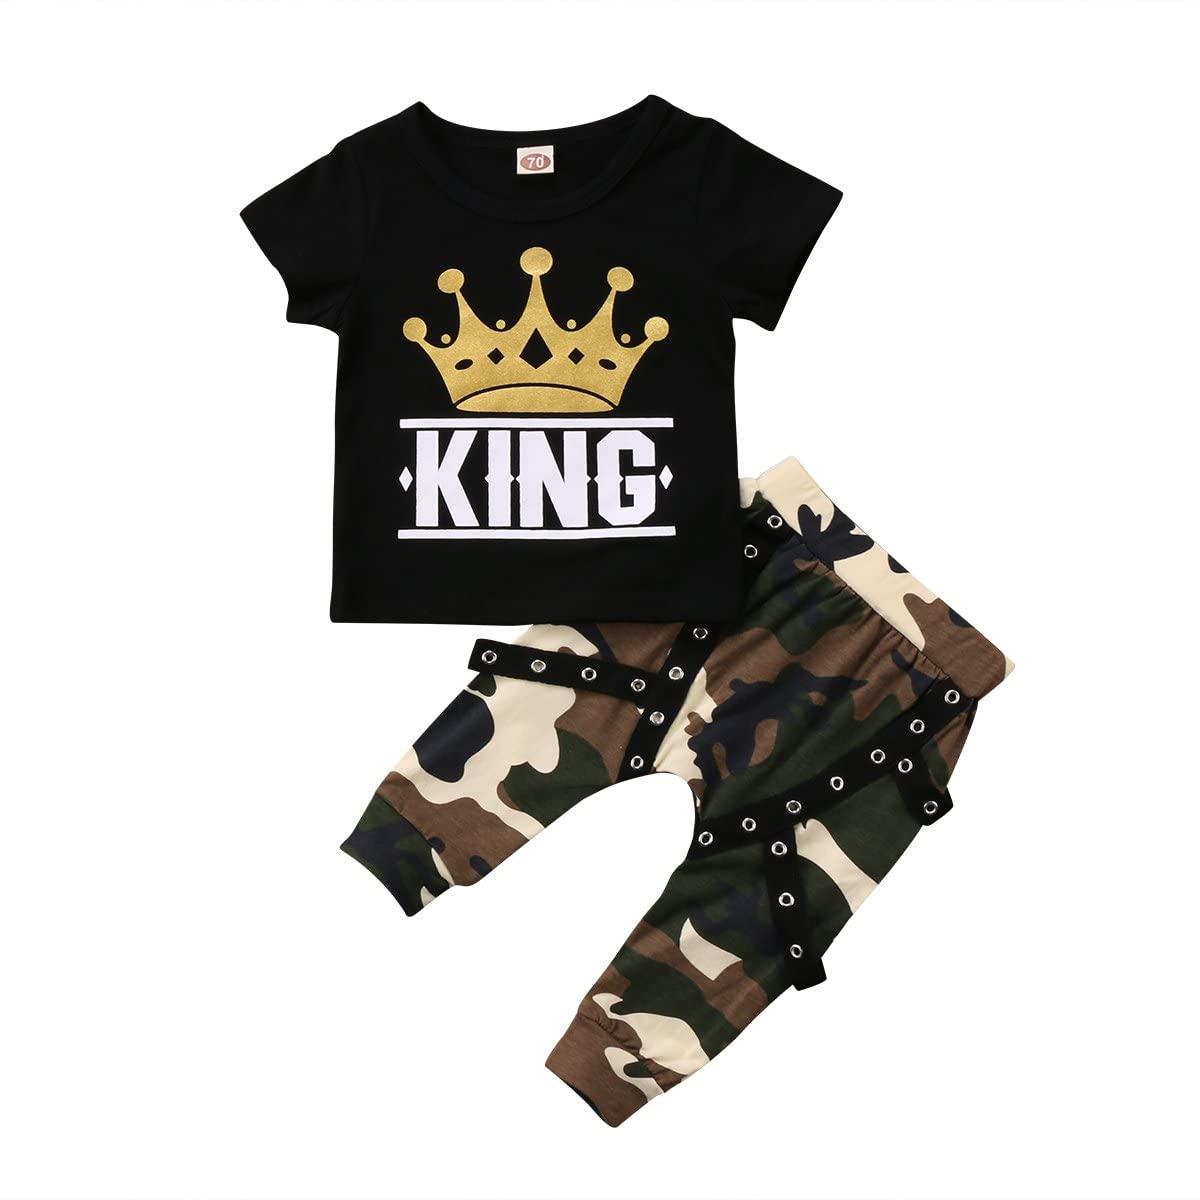 1-5Y Toddler Kid Boy Short Sleeve Crown King Print T-Shirt Baby Bro Camo Long Pants Summer Clothes Outfit Sets 2PCS